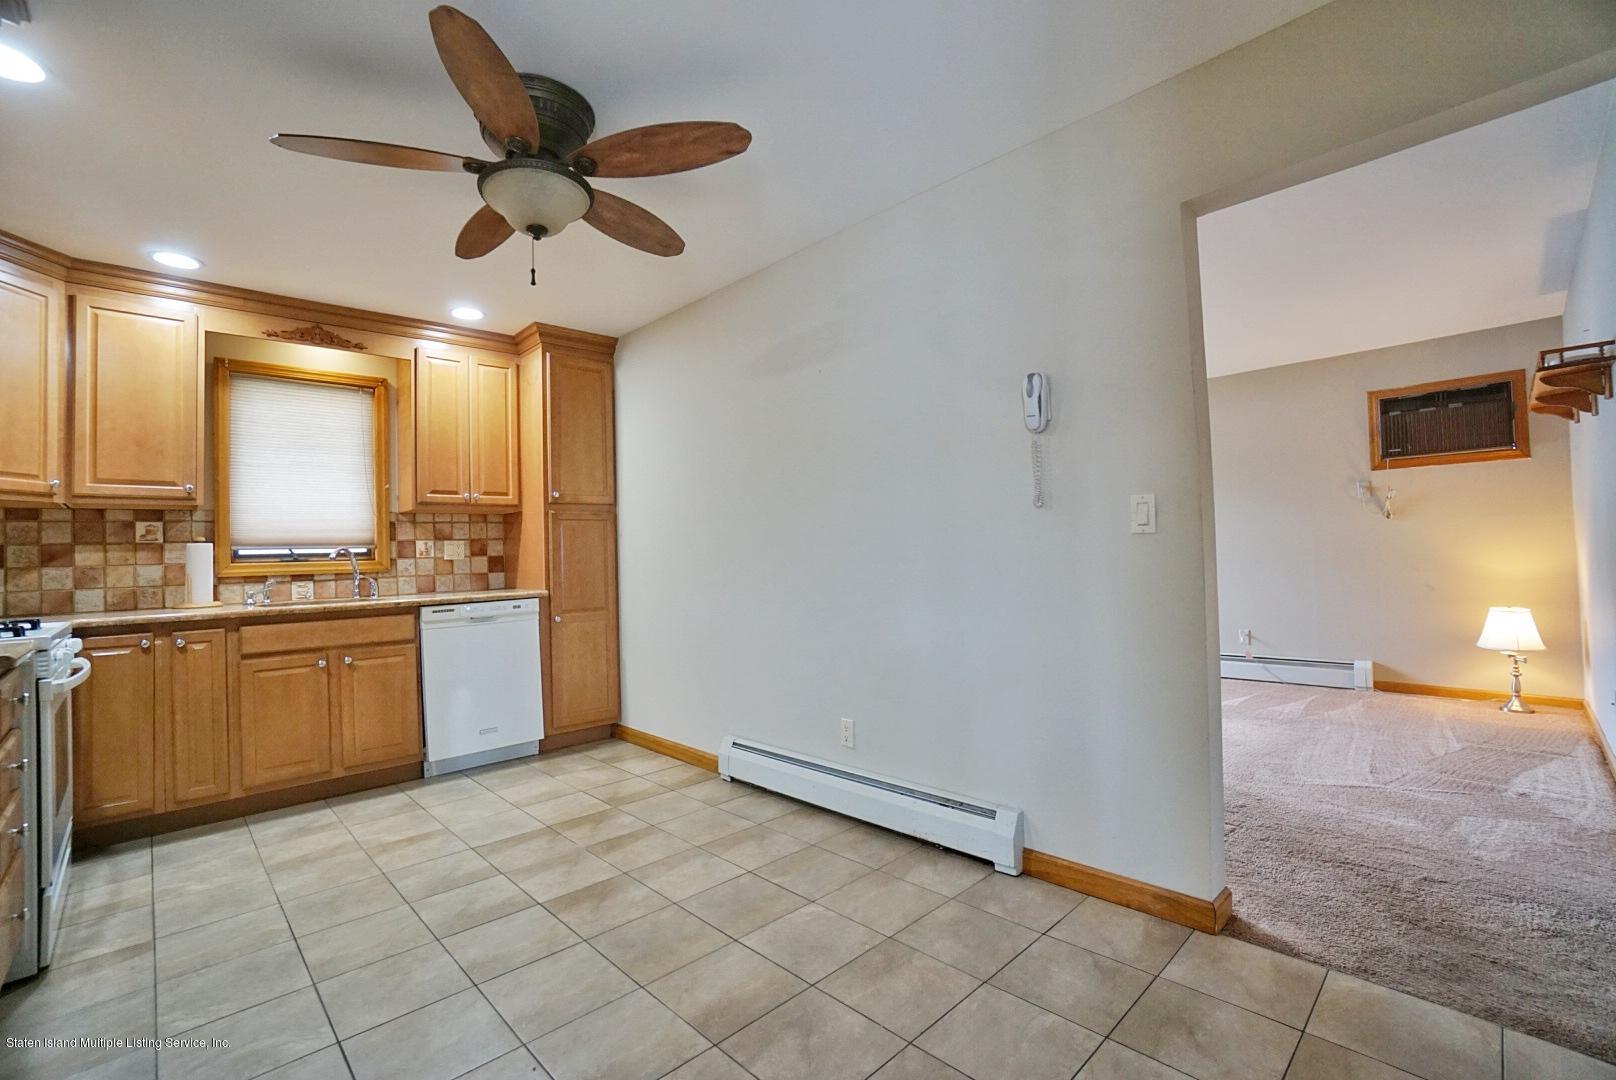 Single Family - Detached 55 Lyndale Avenue  Staten Island, NY 10312, MLS-1128769-7